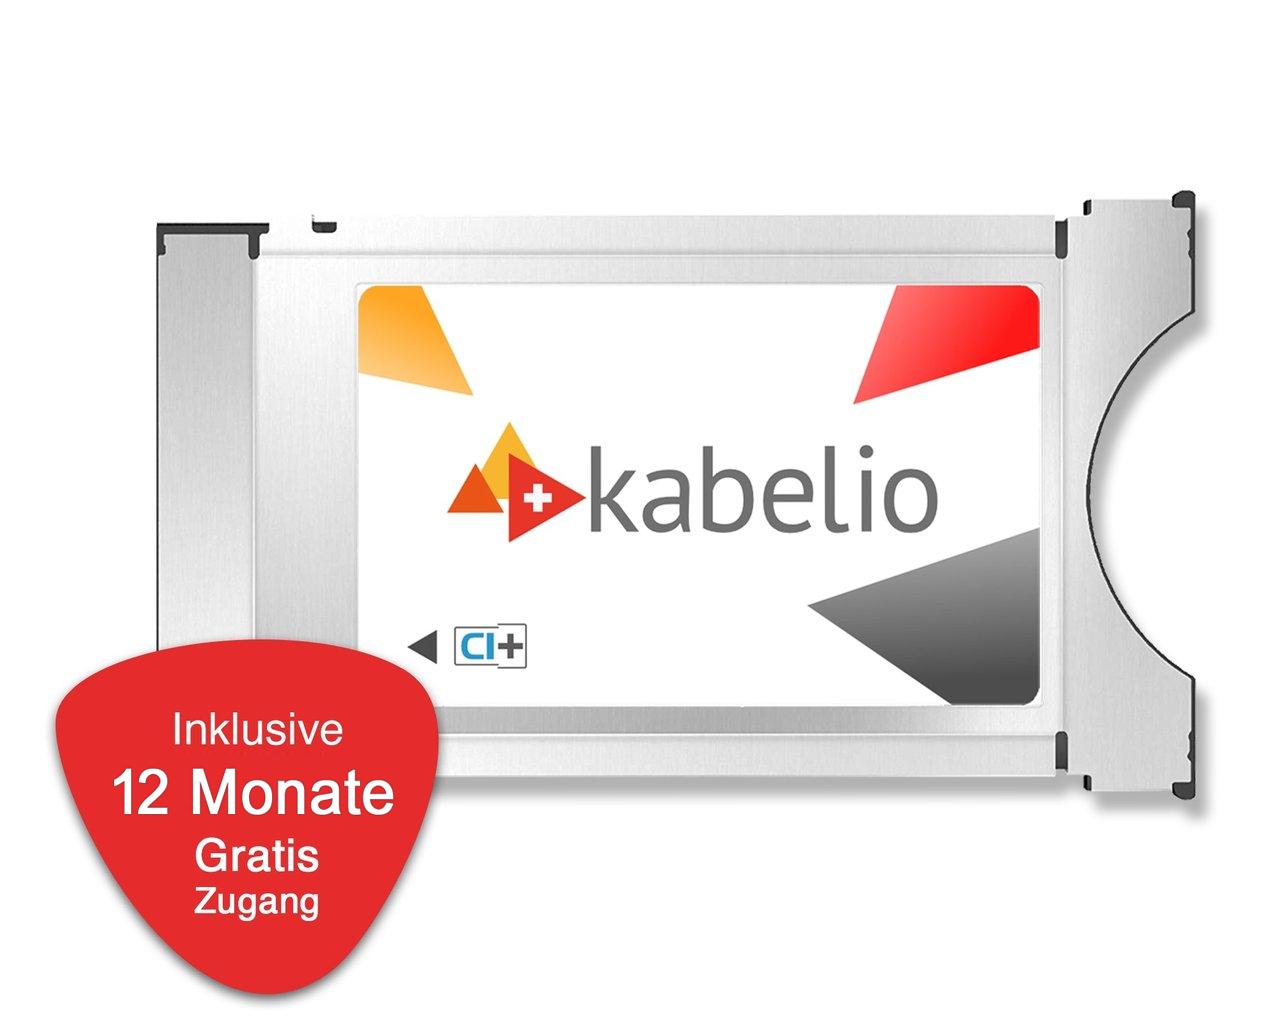 Kabelio CI+ Zugangsmodul inkl. 12 Monate Gratis-Zugang für SAT